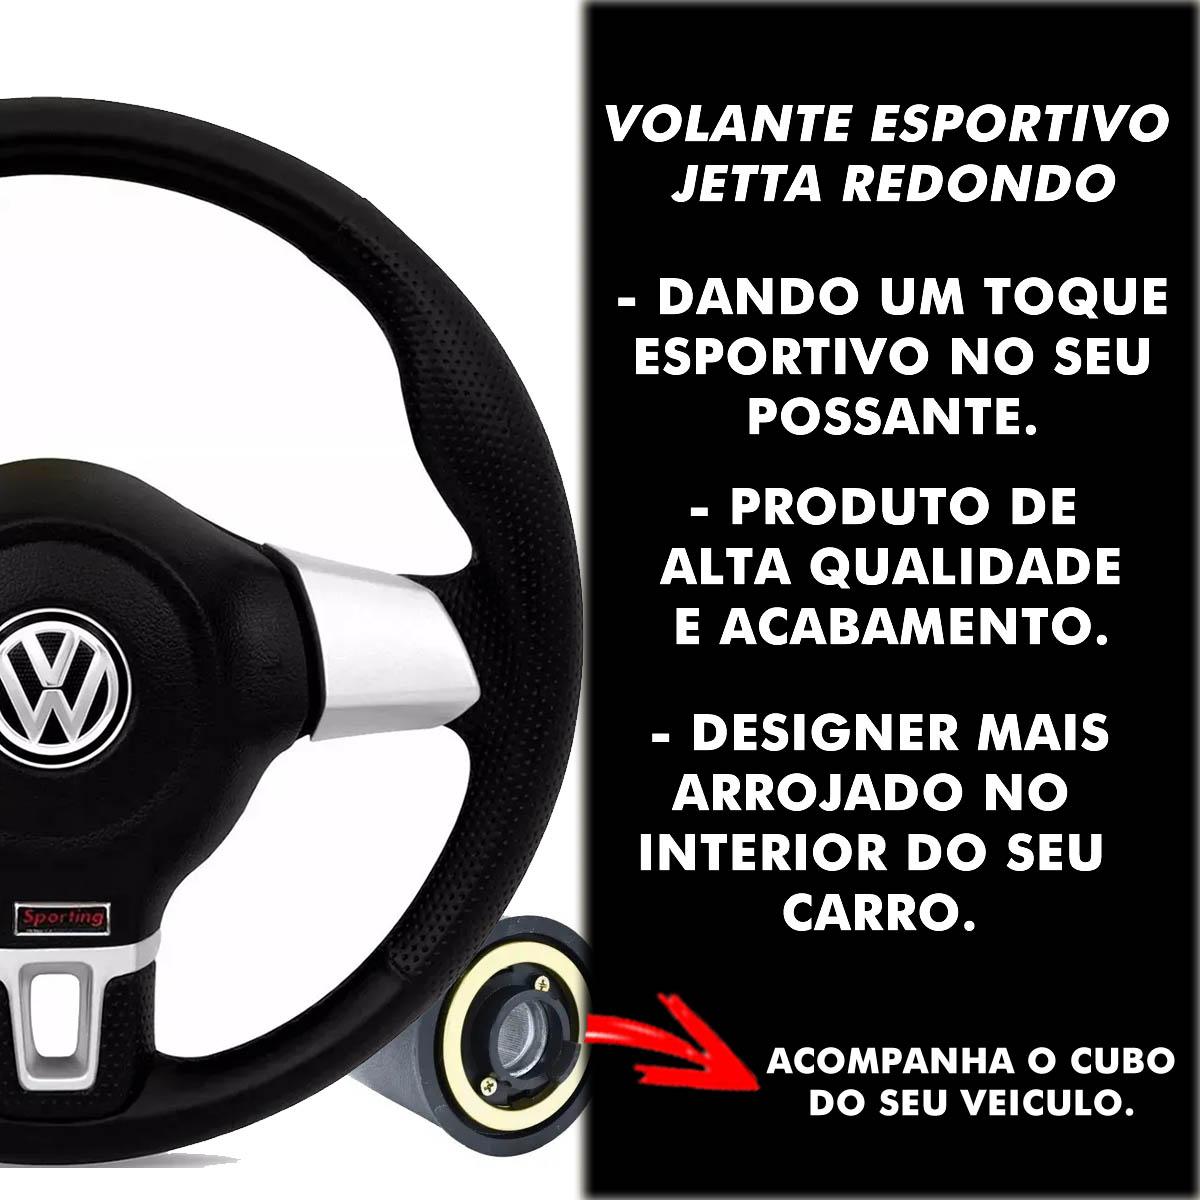 Volante Volkswagen Jetta Redondo Esportivo Cubo Atacado Poliparts